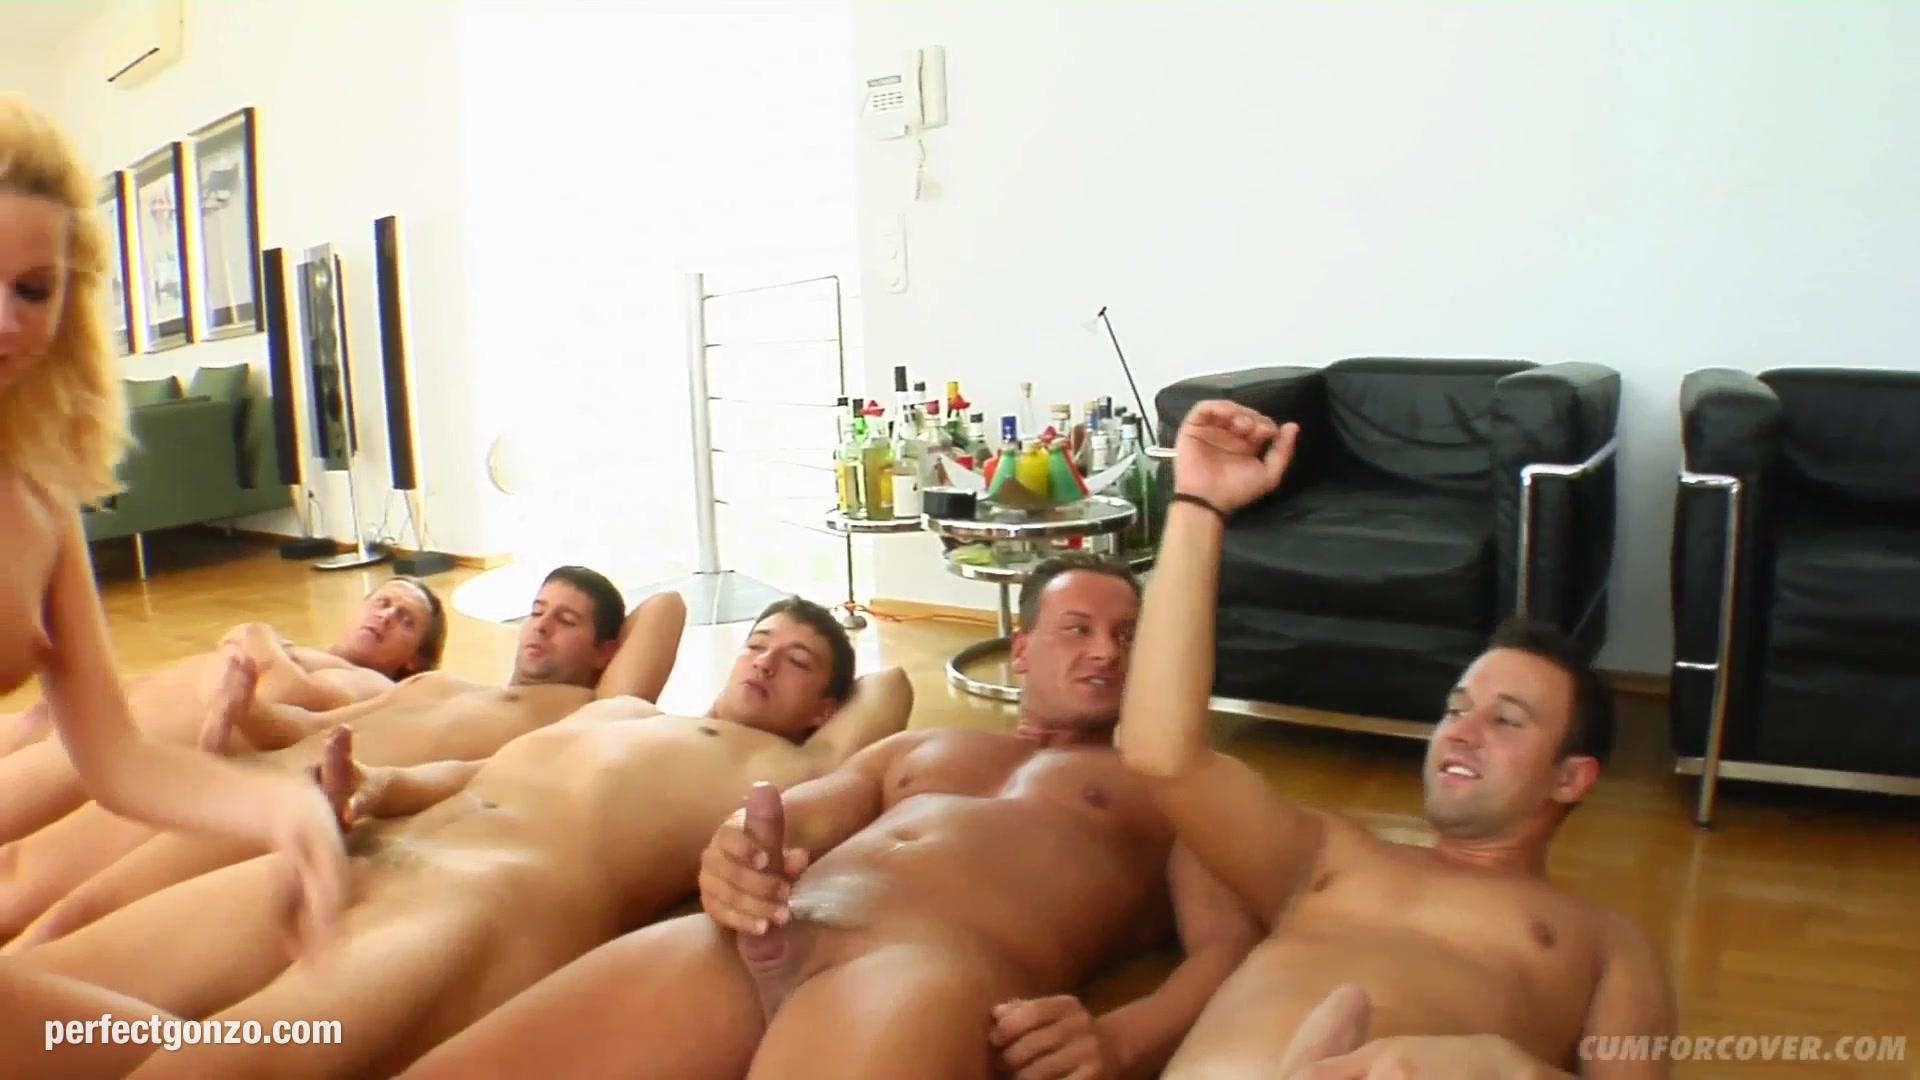 Hairy bbw masturbates on cam Adult Videos